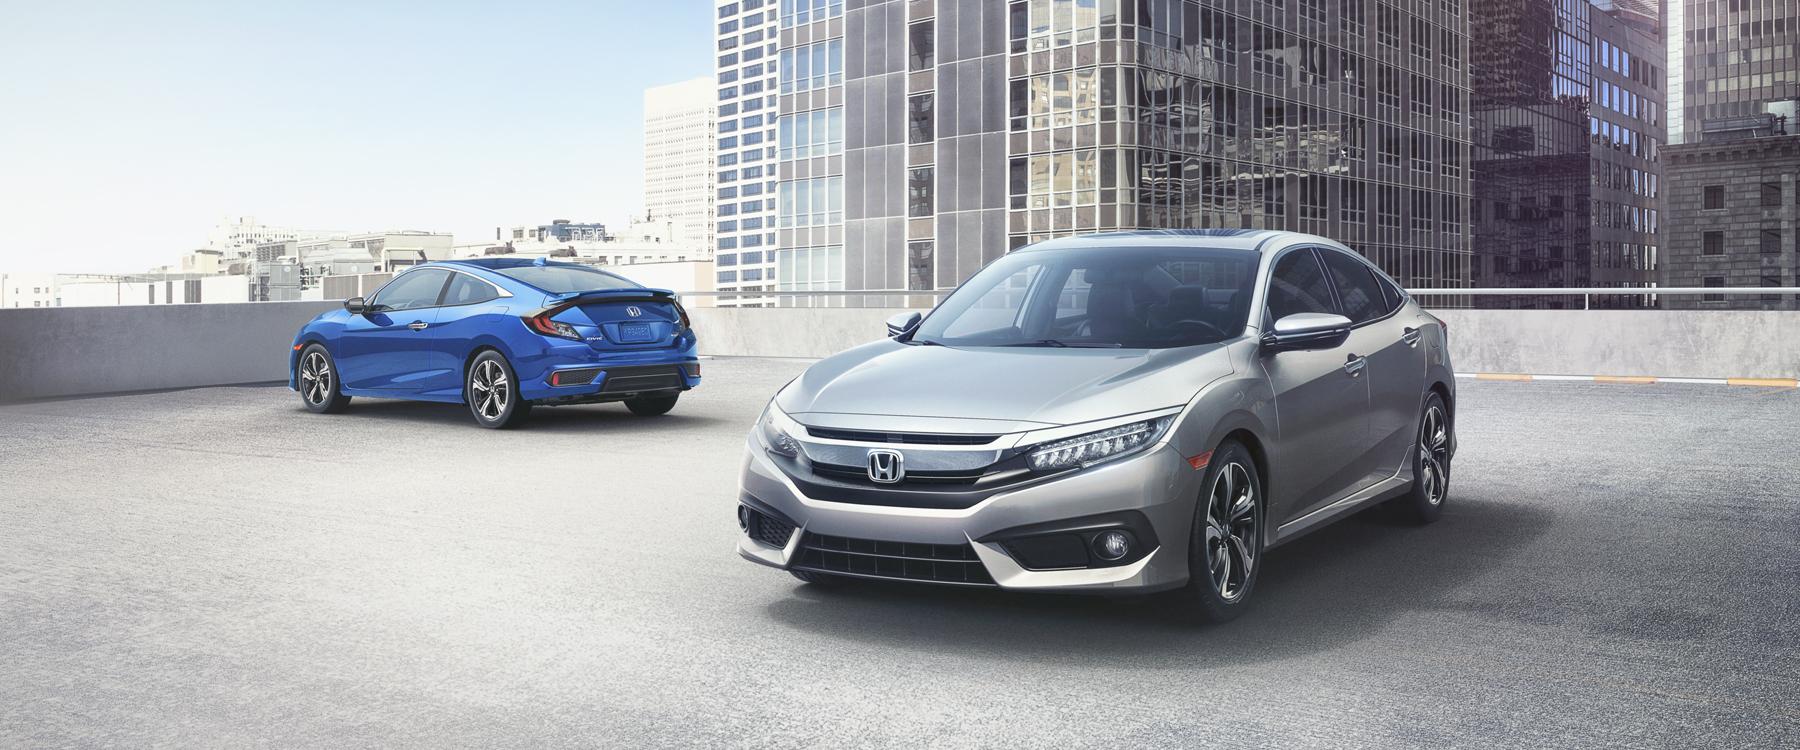 Shop the Safest Sedans at Metro Milwaukee Honda Dealers